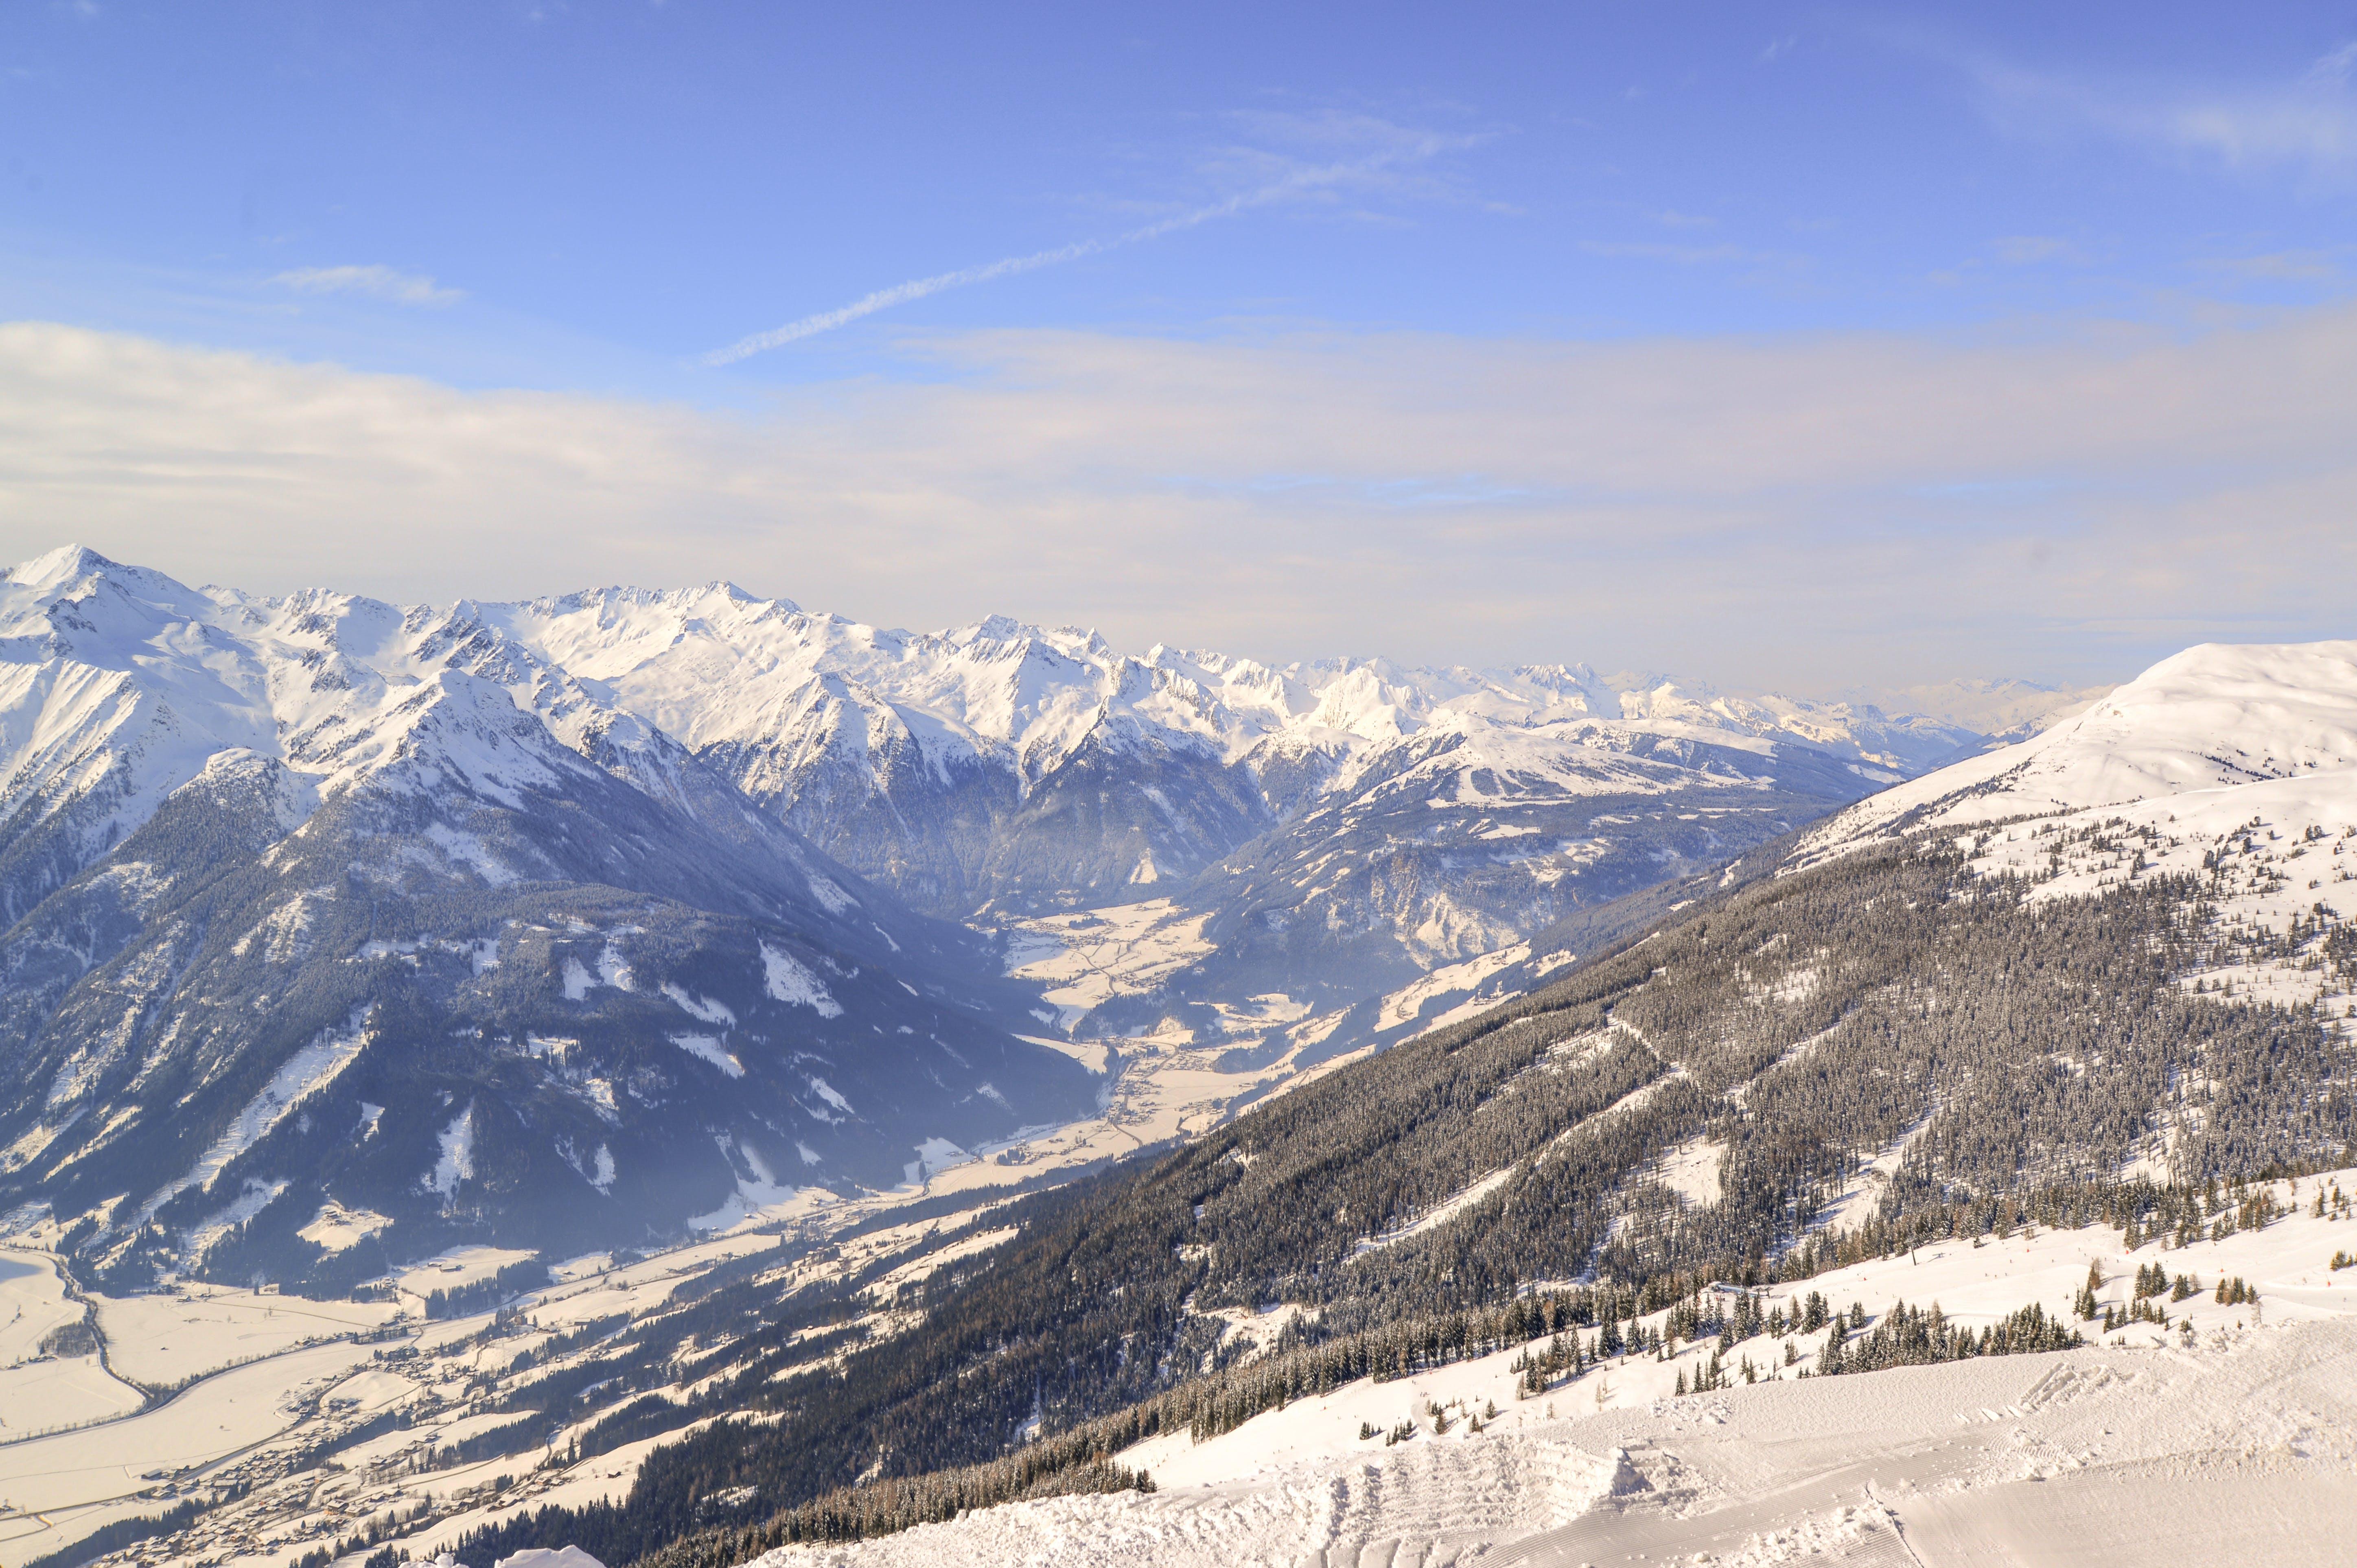 Kostenloses Stock Foto zu abenteuer, alpin, bäume, berge